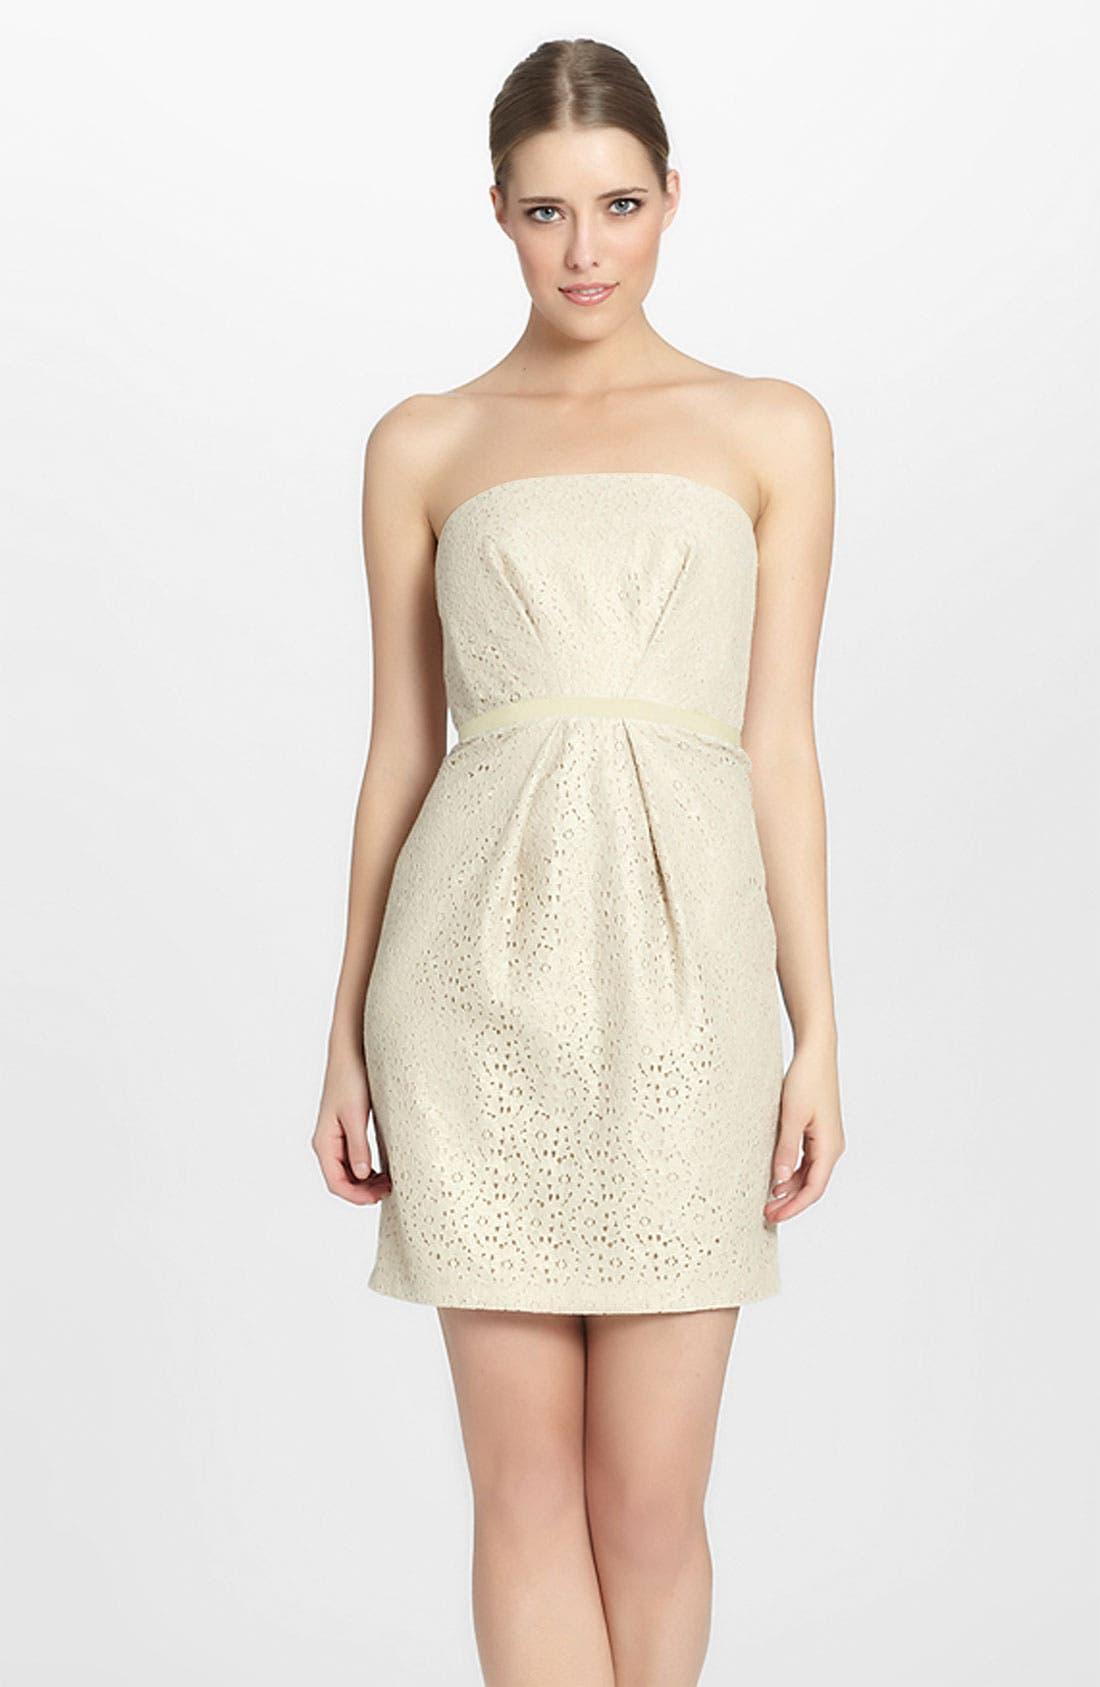 Main Image - Seamline Cynthia Steffe 'Chloe' Foiled Lace Sheath Dress